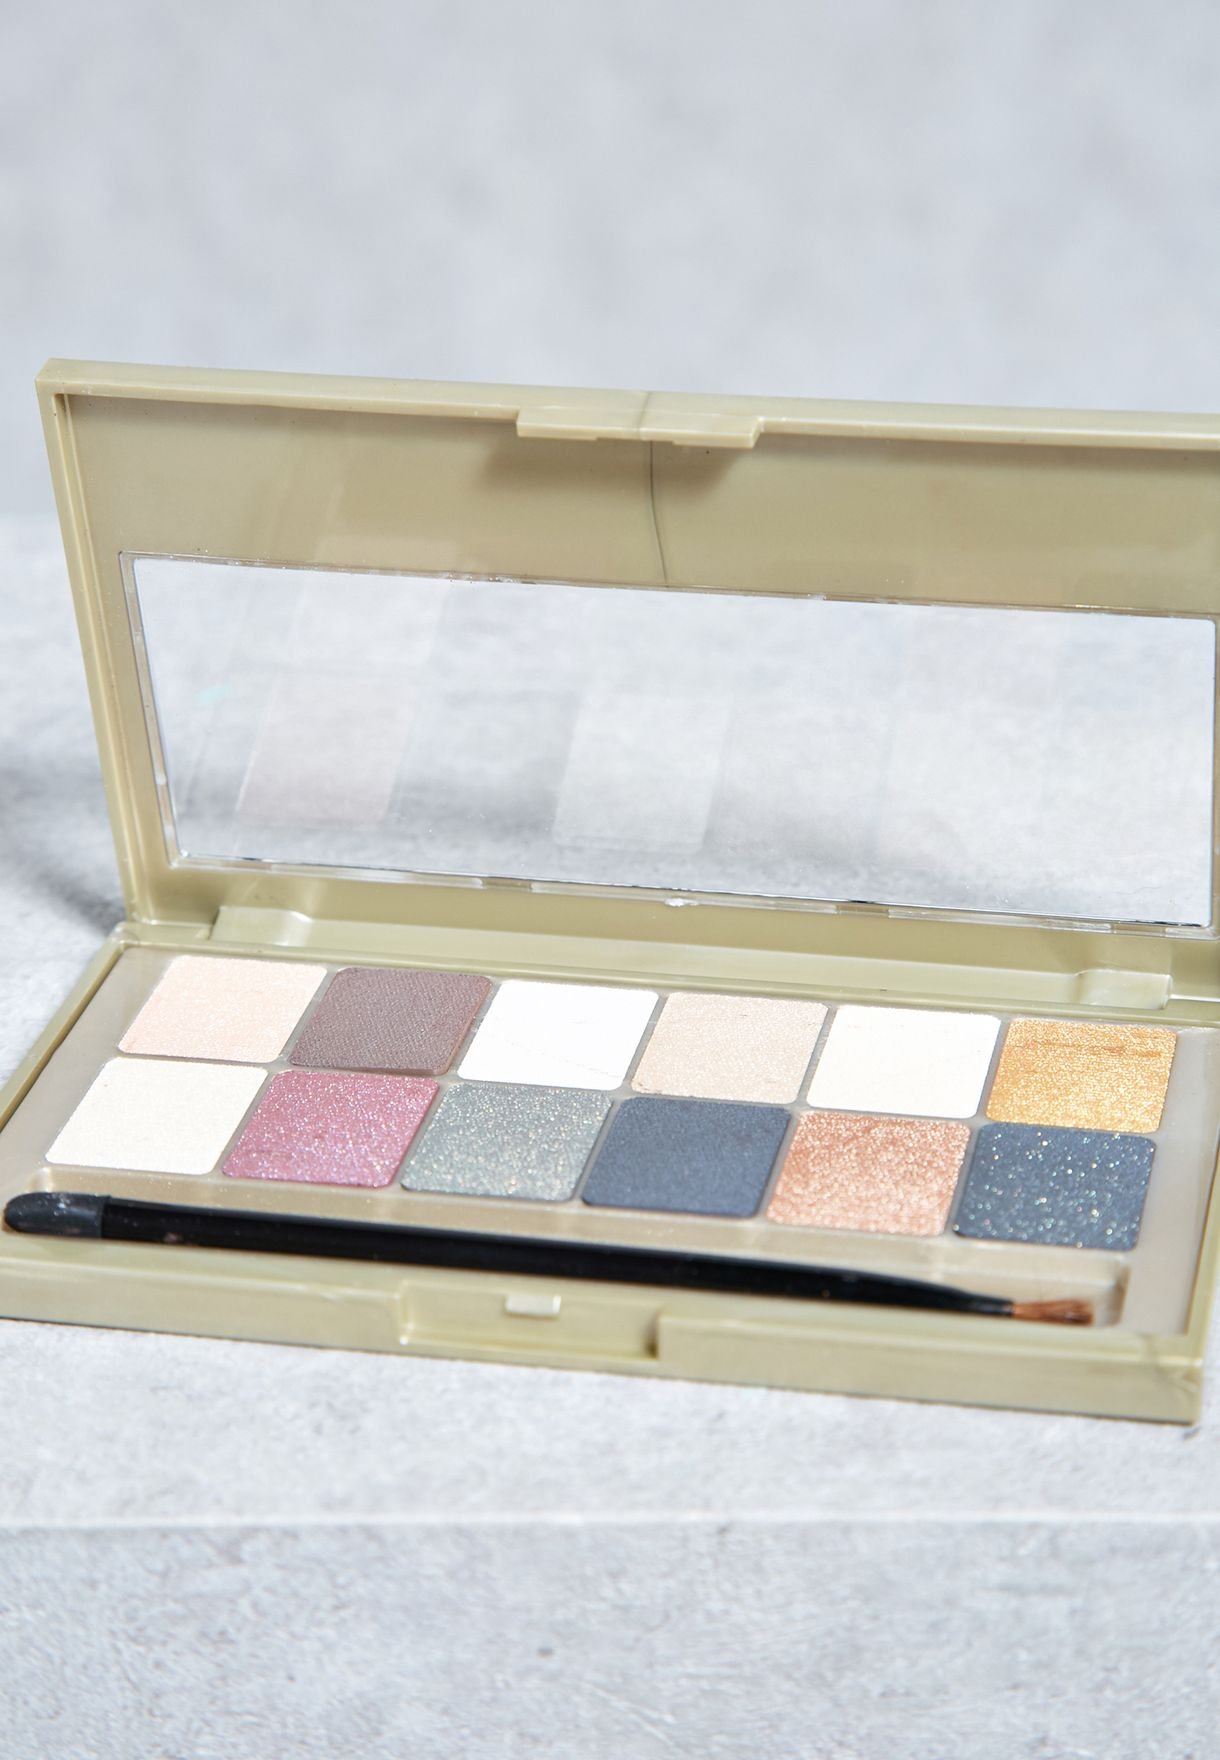 24 Karat Nudes Eyeshadow Palette